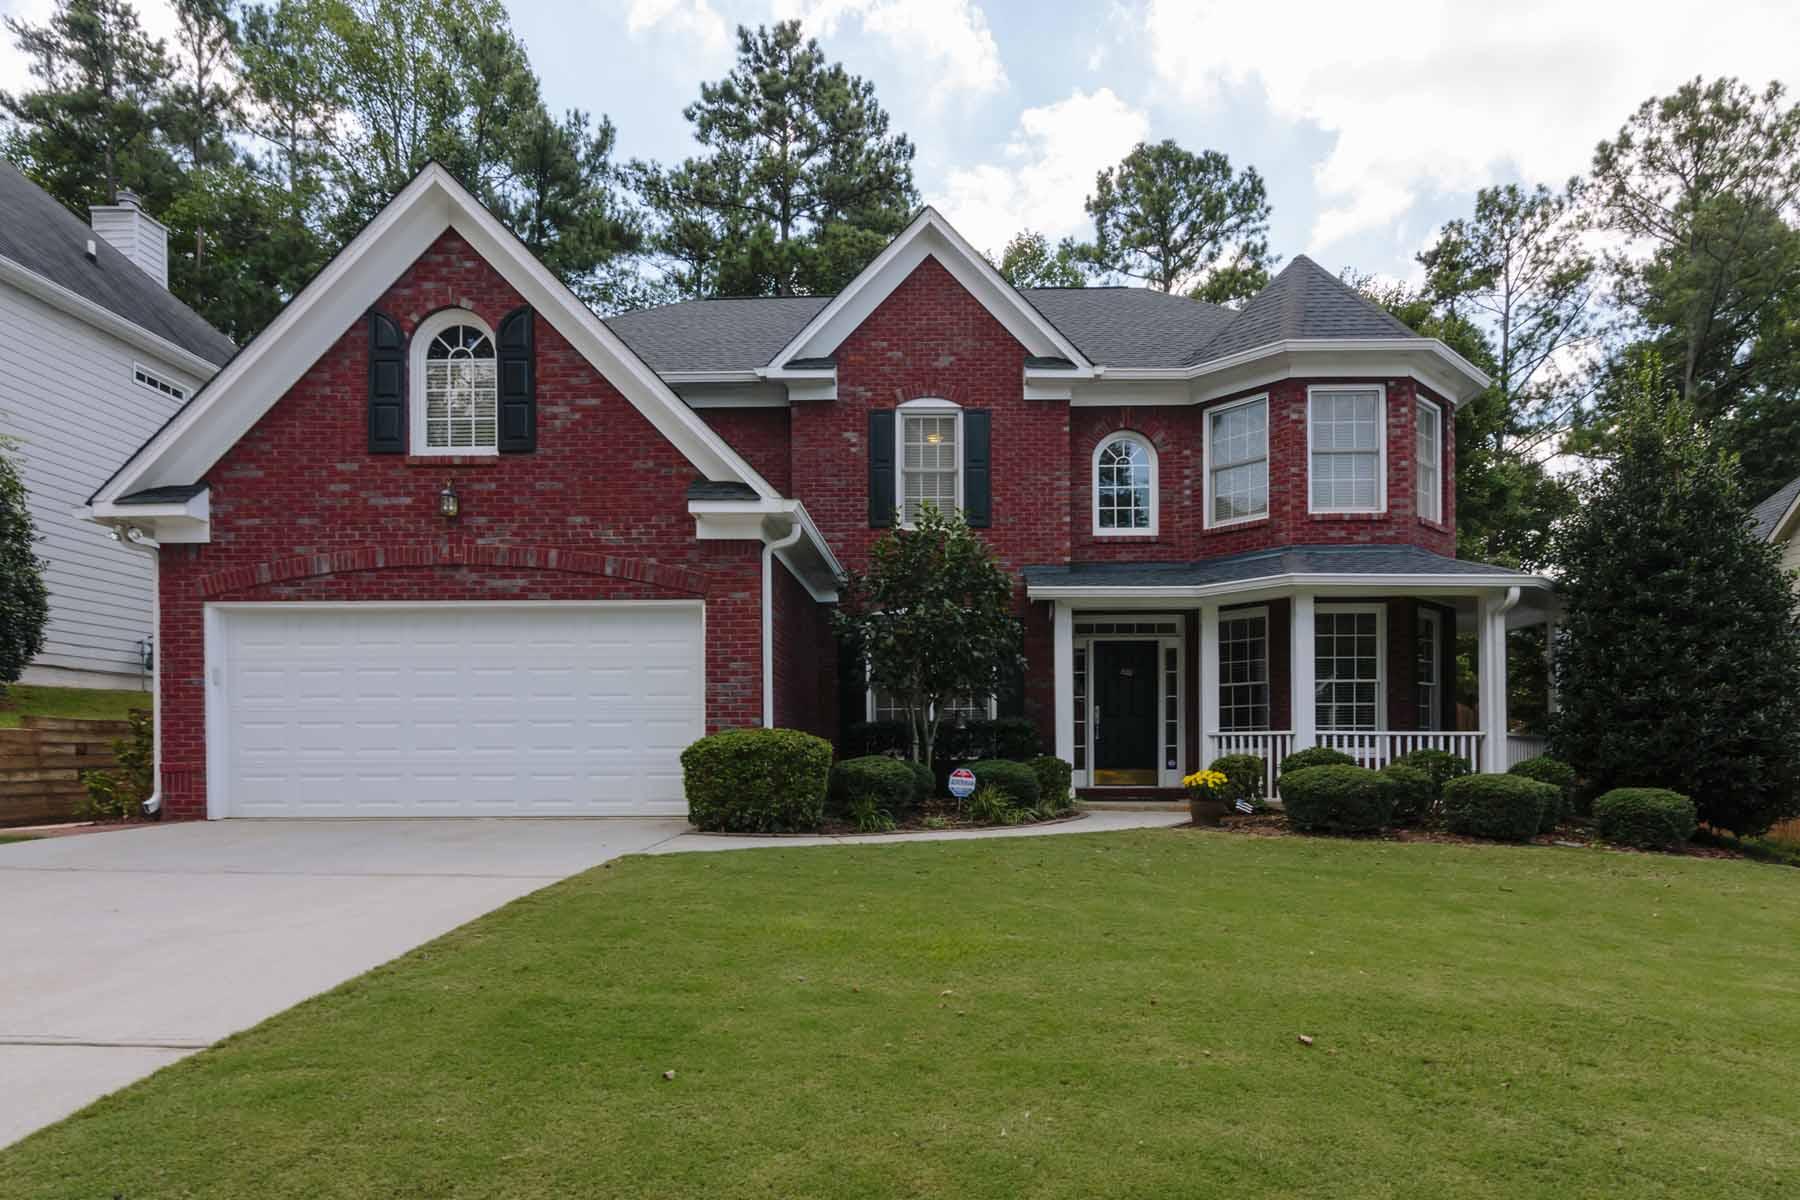 Villa per Vendita alle ore Spacious Four Bedroom Home With Recent Renovations 350 Park Creek Drive Alpharetta, Georgia 30005 Stati Uniti